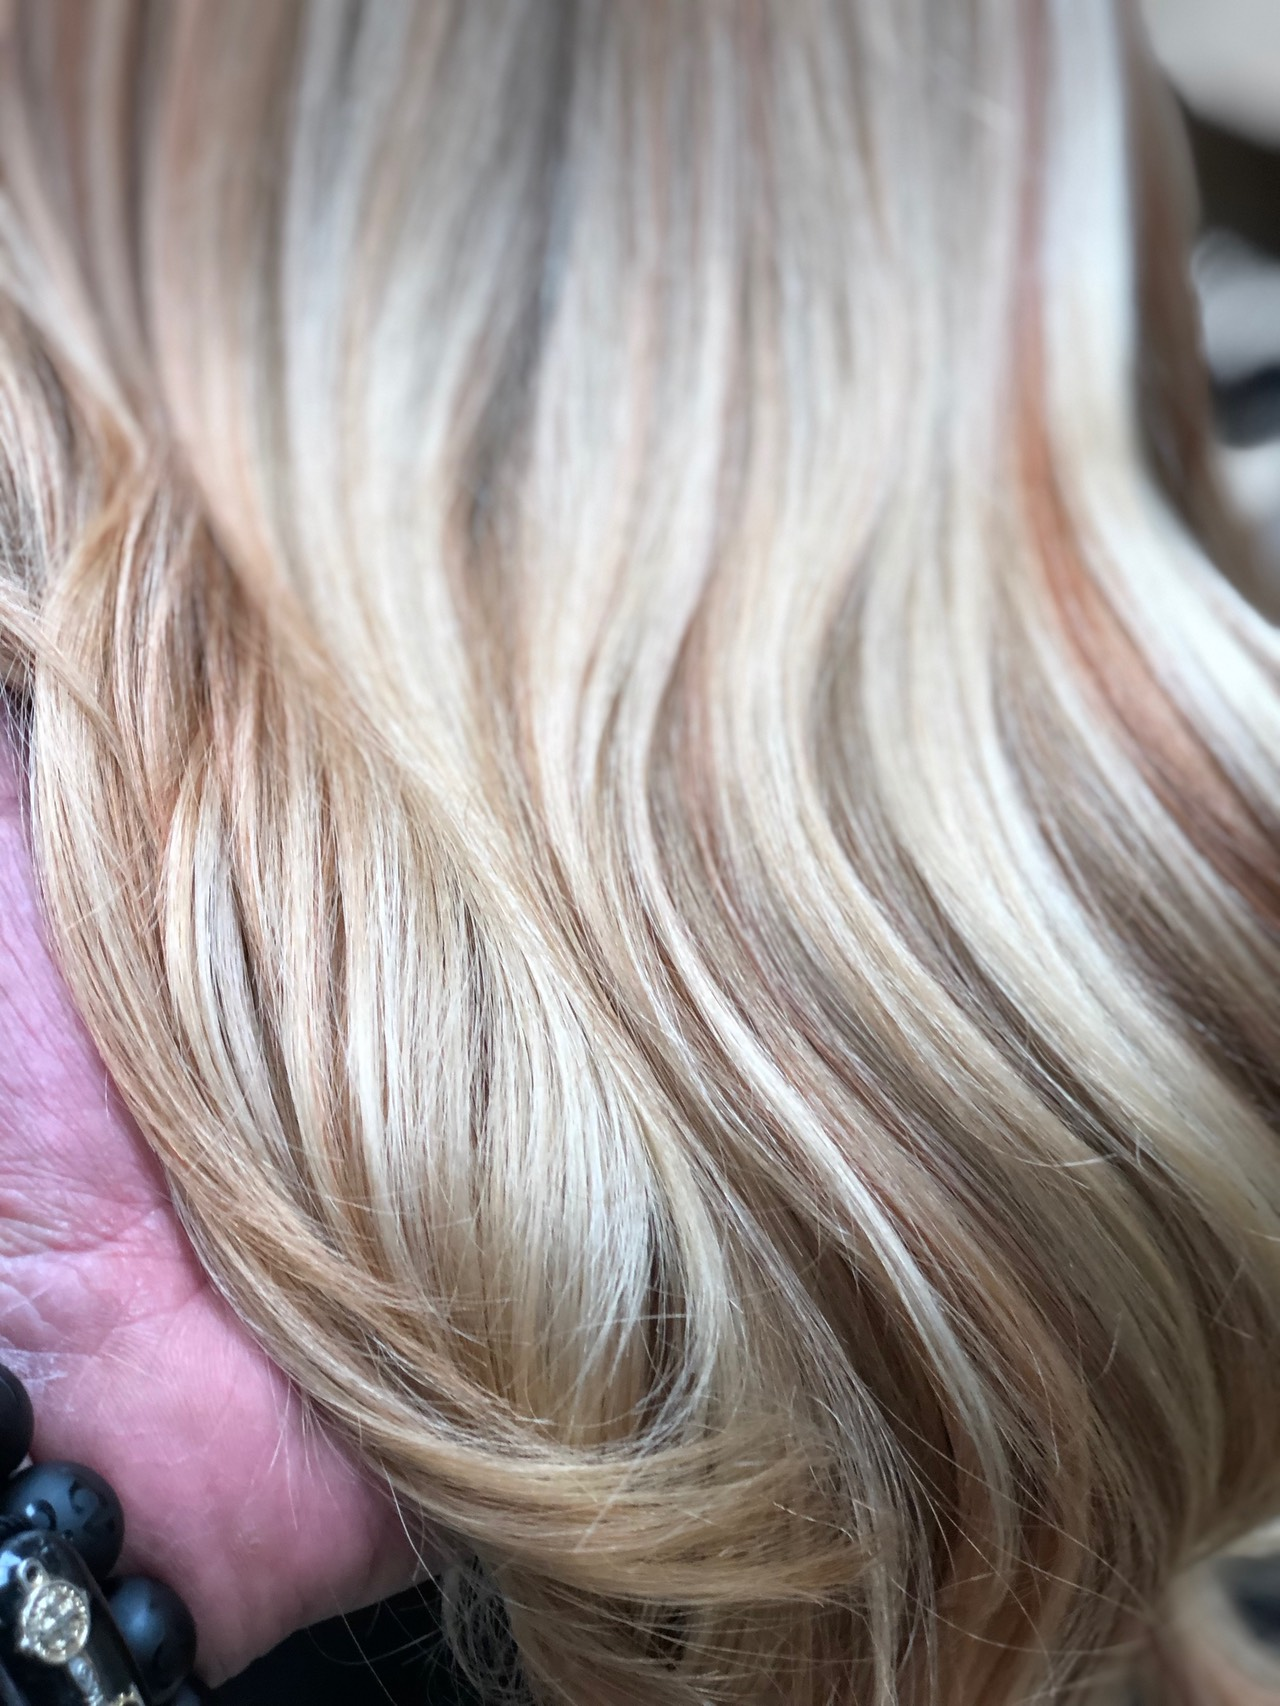 Blonde Hair Painting : blonde, painting, Painting, Color, Colorist, Martin, Rodriguez, Salon, 18120, Brookhurst, Fountain, .valley, ,92708